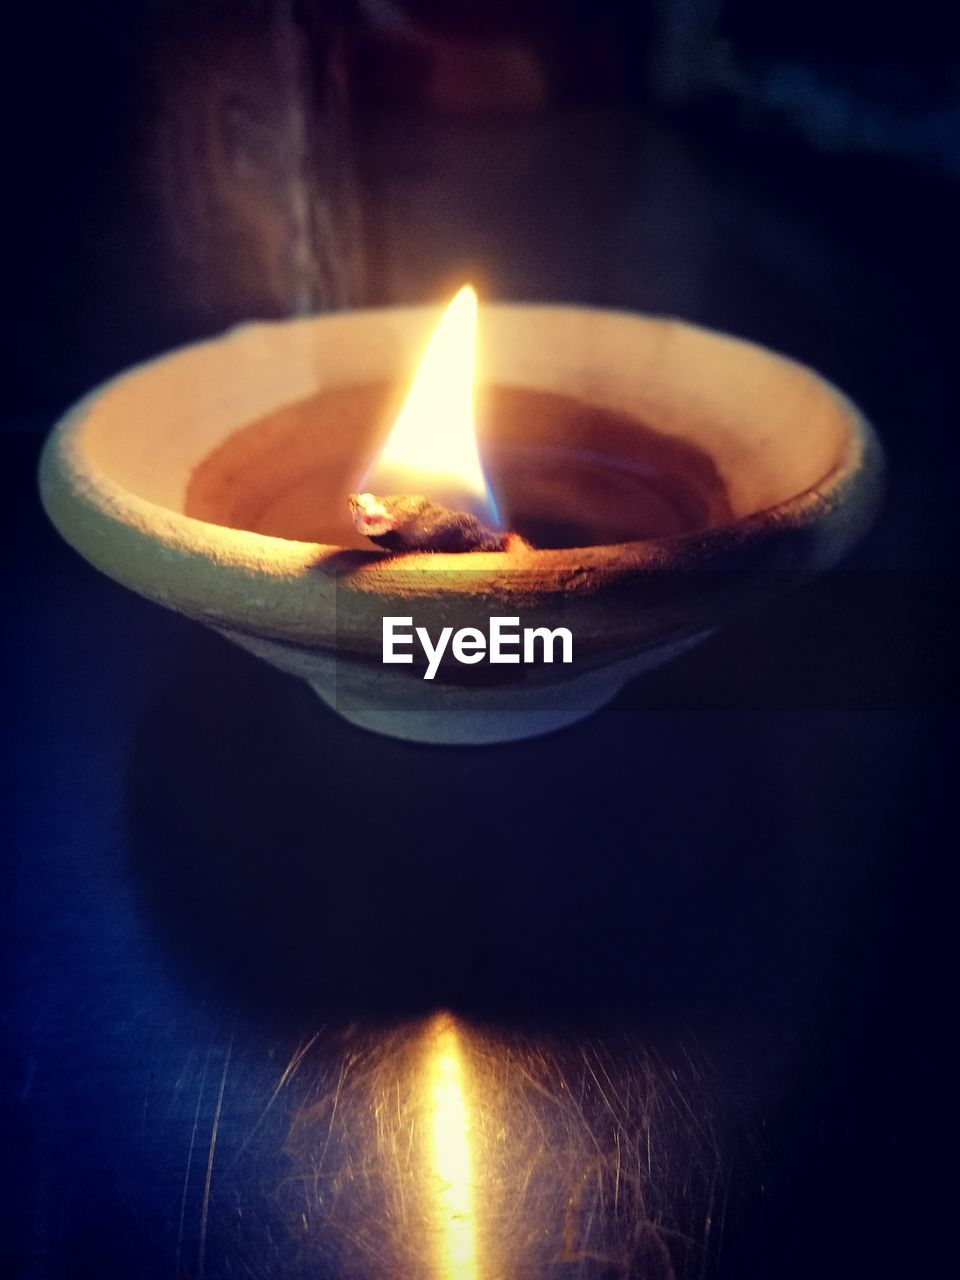 flame, burning, heat - temperature, diya - oil lamp, candle, no people, close-up, oil lamp, glowing, indoors, lighting equipment, illuminated, celebration, table, black background, diwali, night